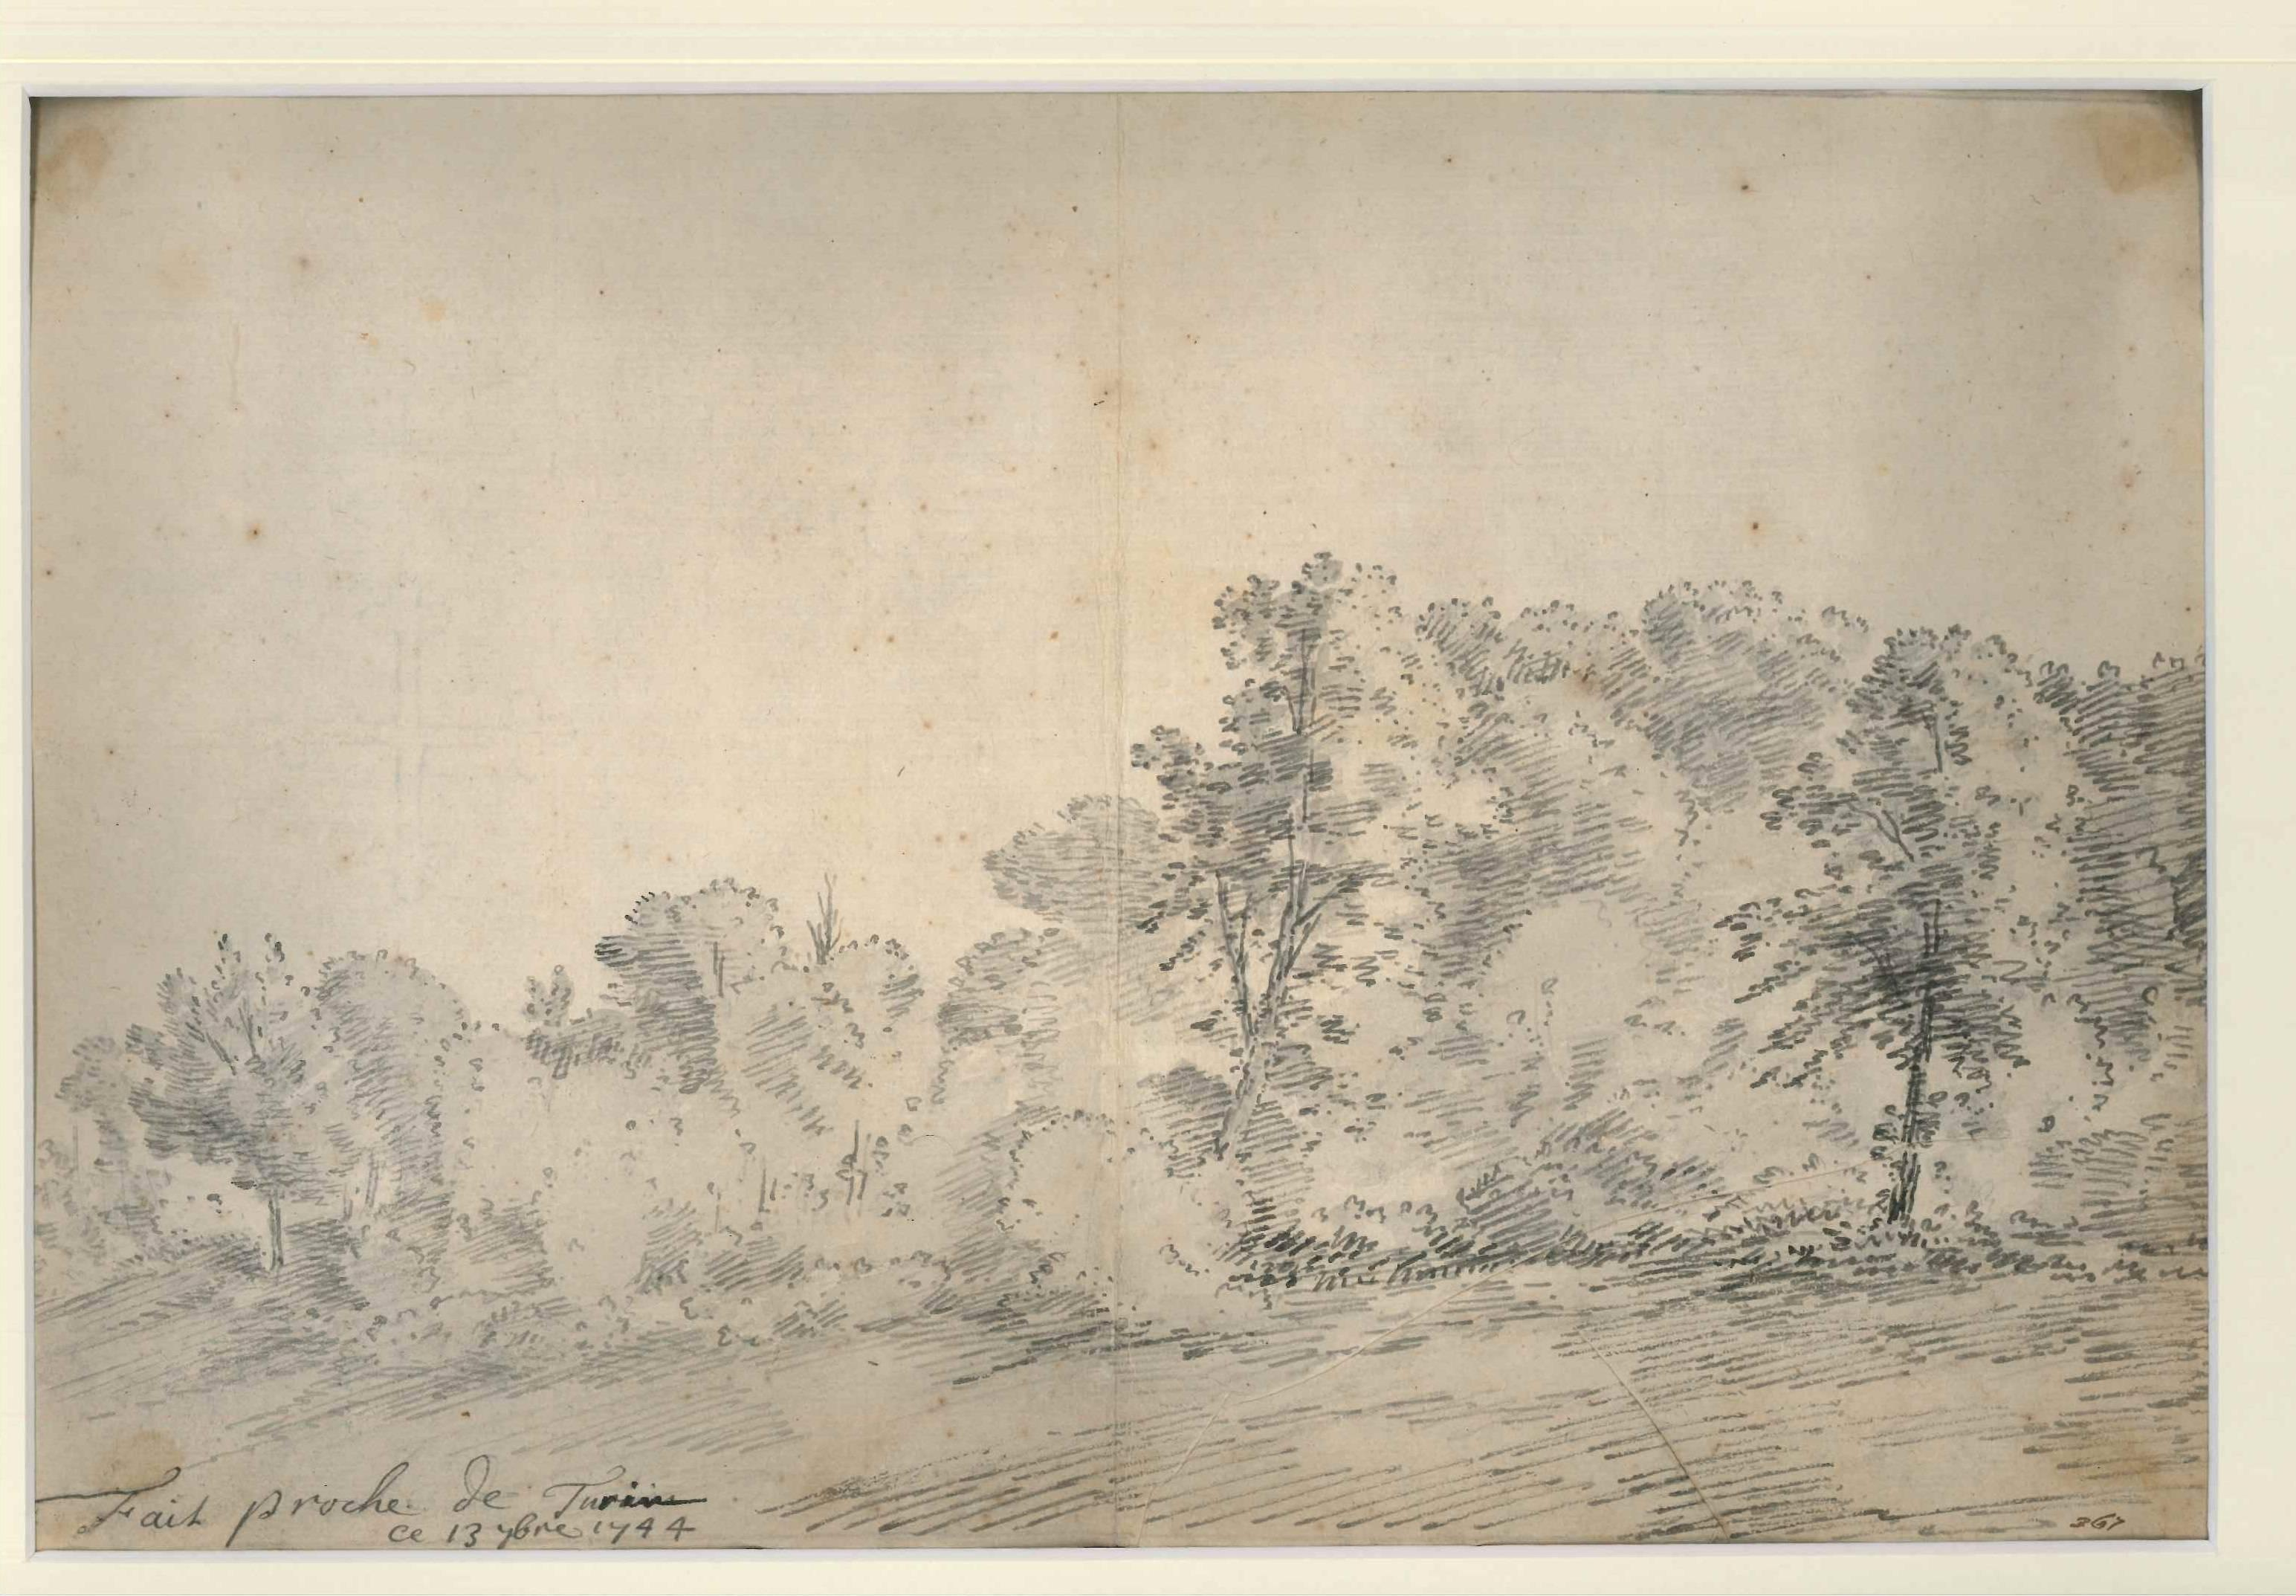 Turin Countryside - Original Ink and Watercolor by Jan Pieter Verdussen - 1744